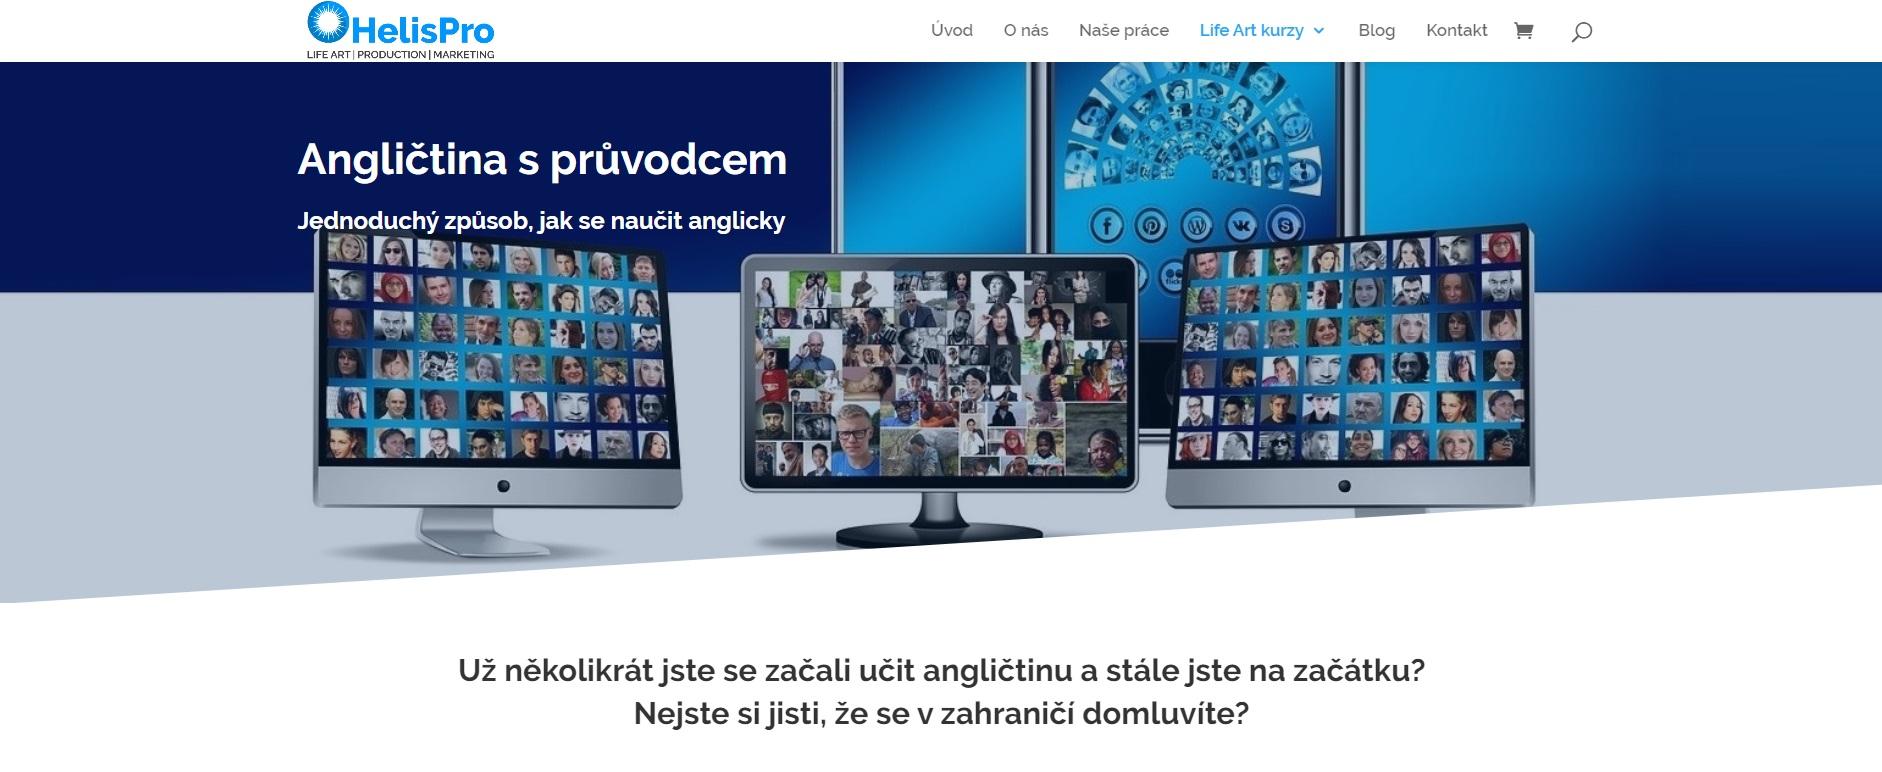 helispro.cz, naseprace, harmonieteladuse.cz, tvorbawebu, strategie, komunikace